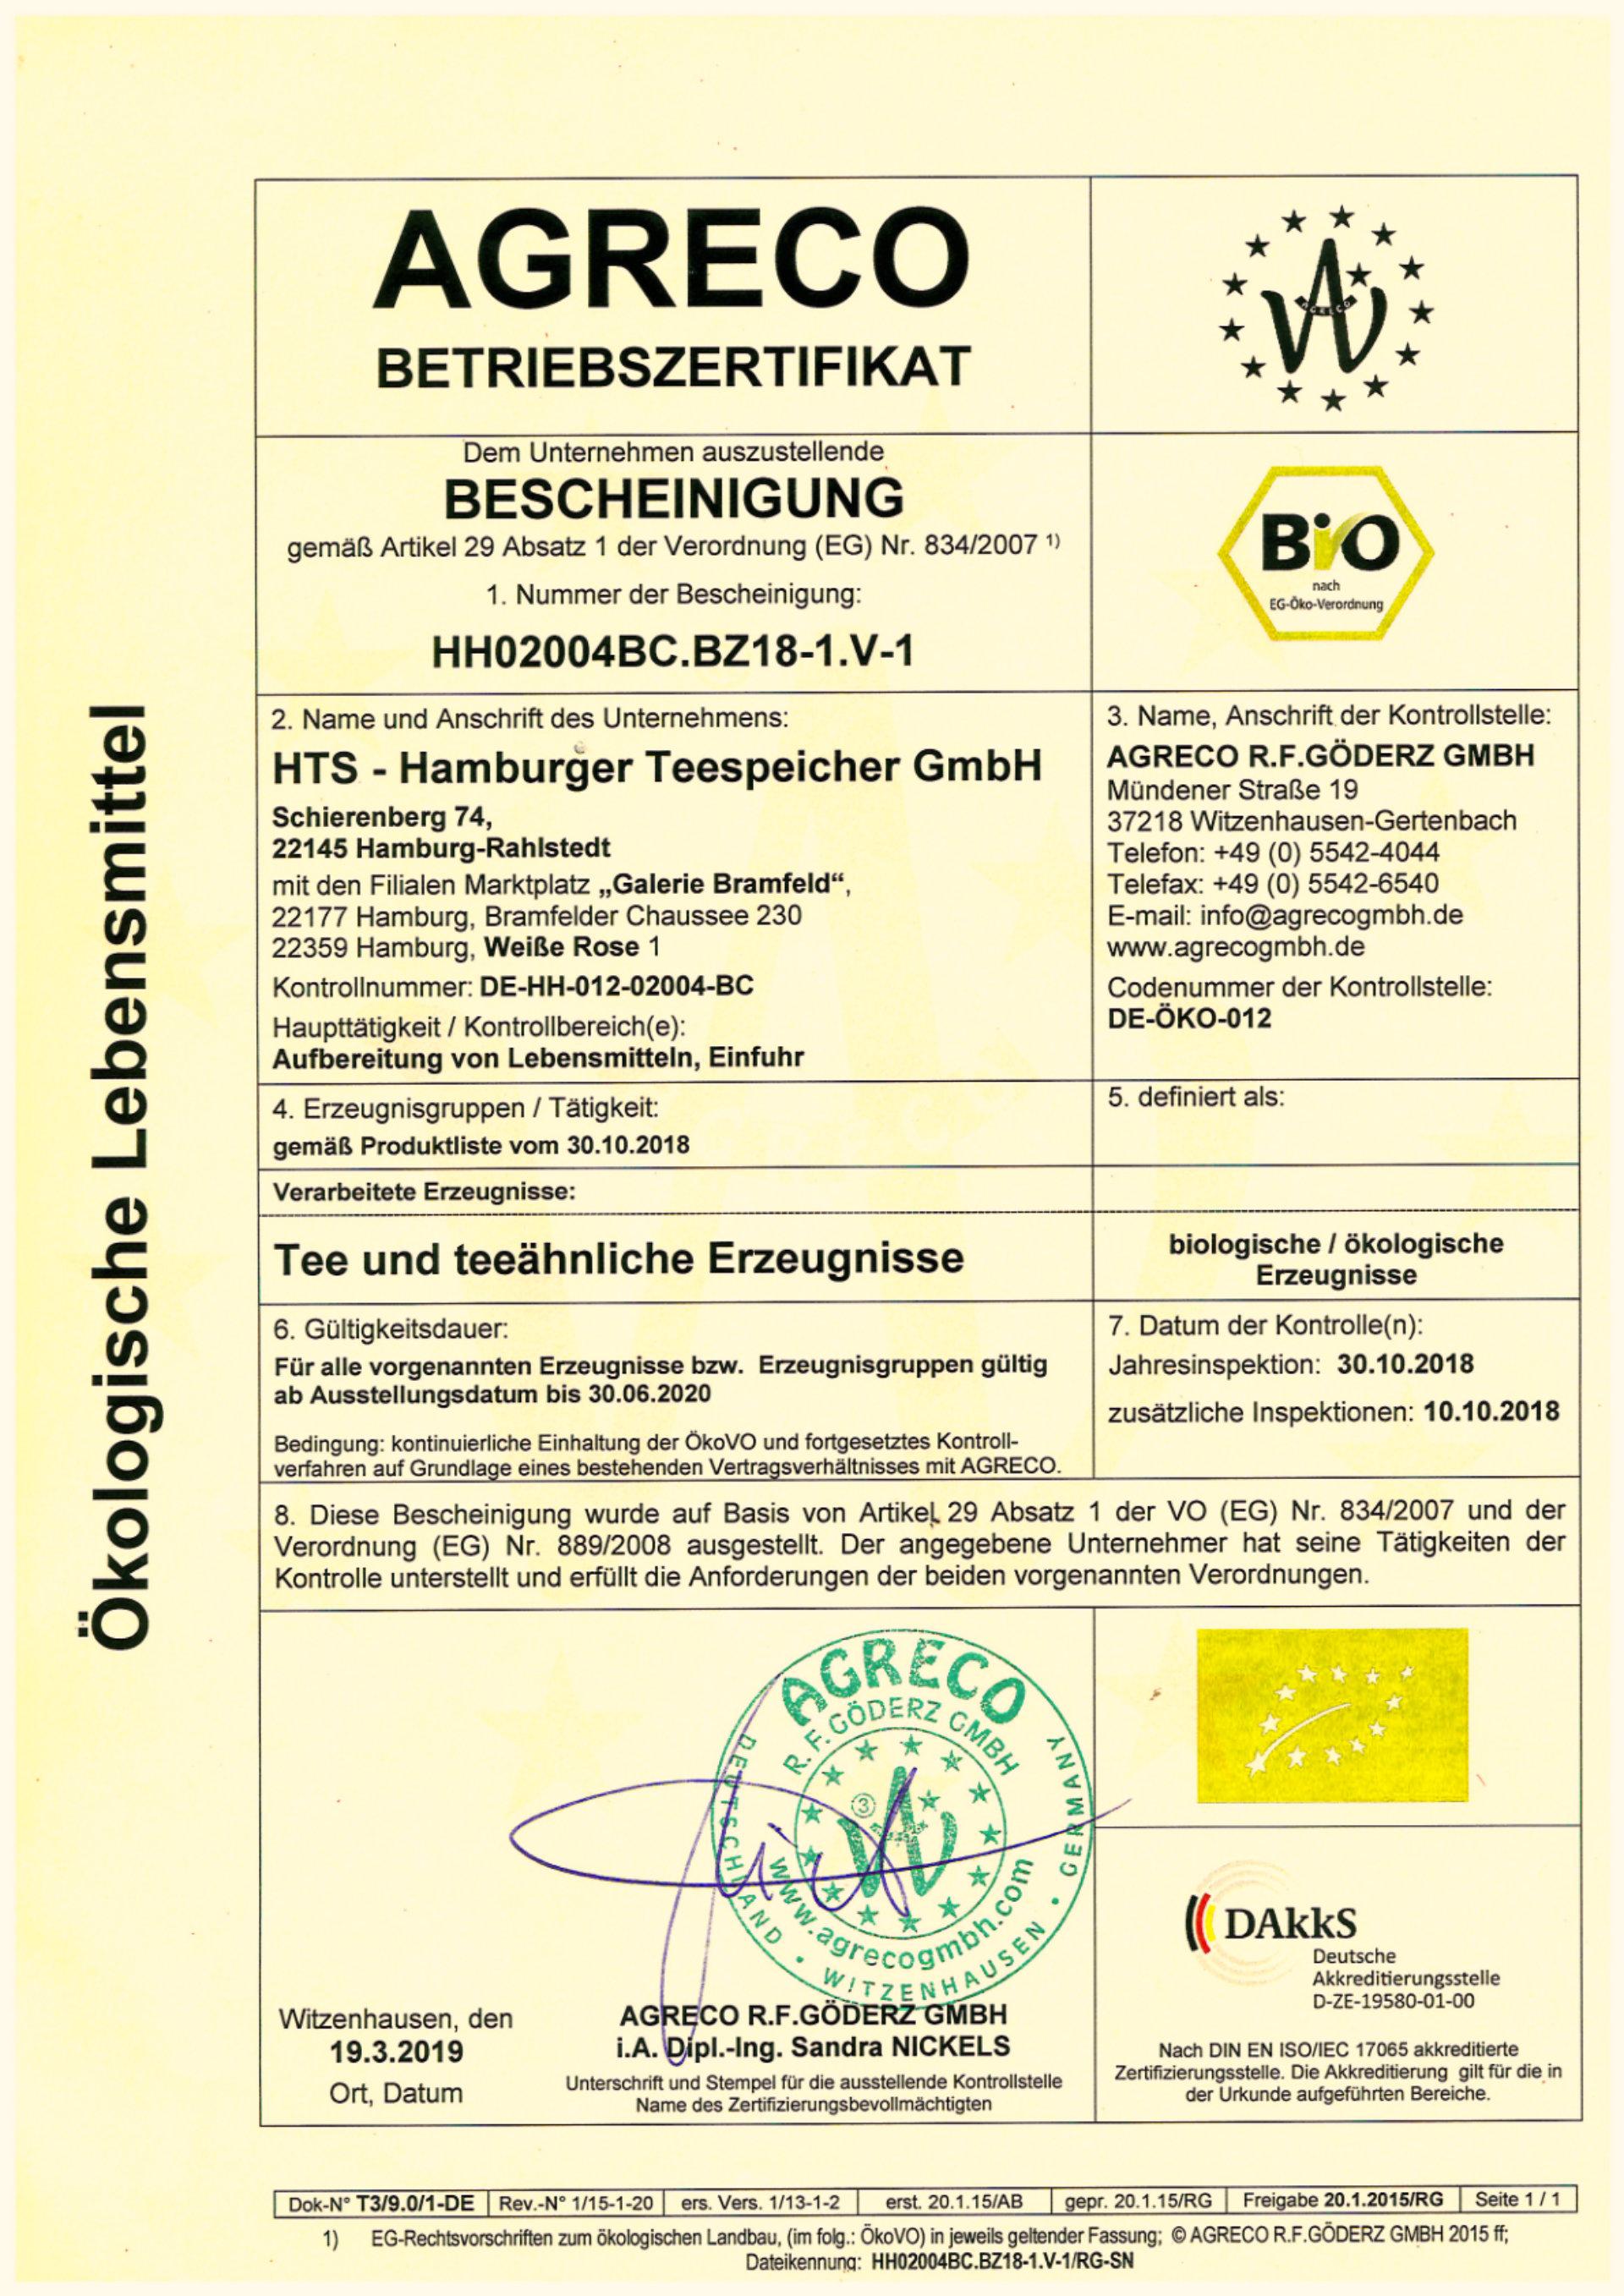 AGRECO_Zertifikat_2019